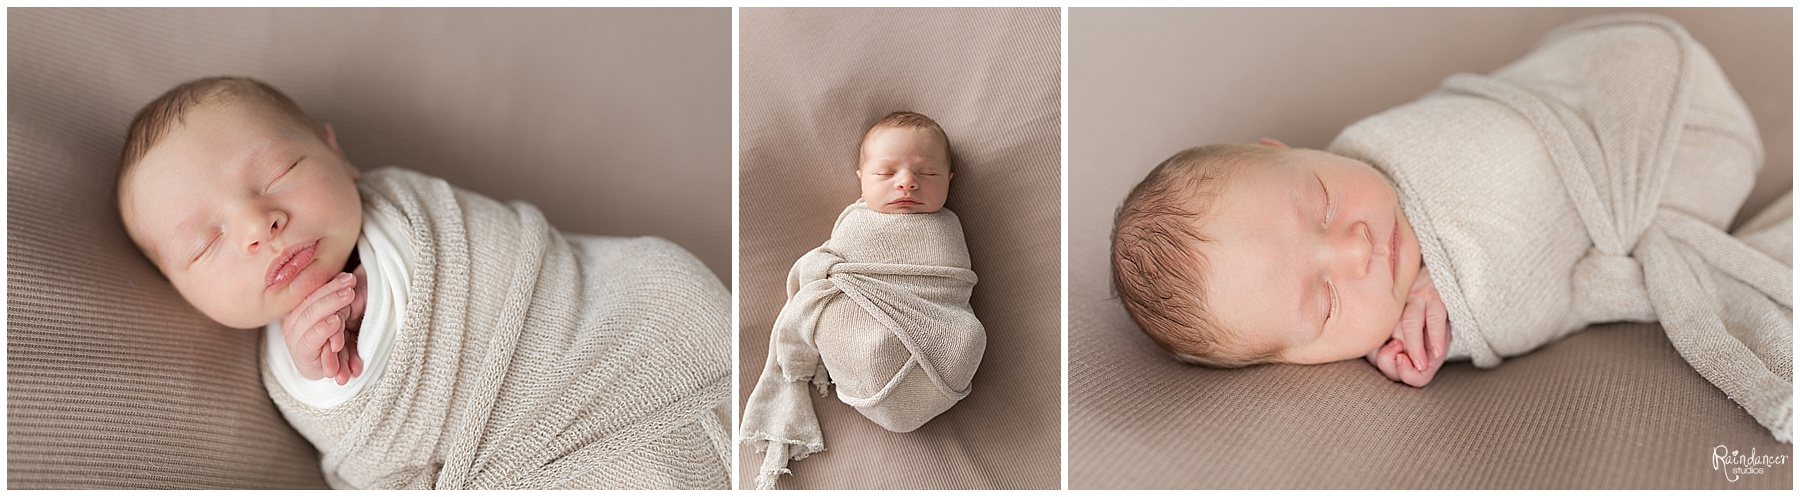 Newborn baby boy sleeping in cream swaddle by Raindancer Studios Indianapolis Newborn Photographer Jill Howell